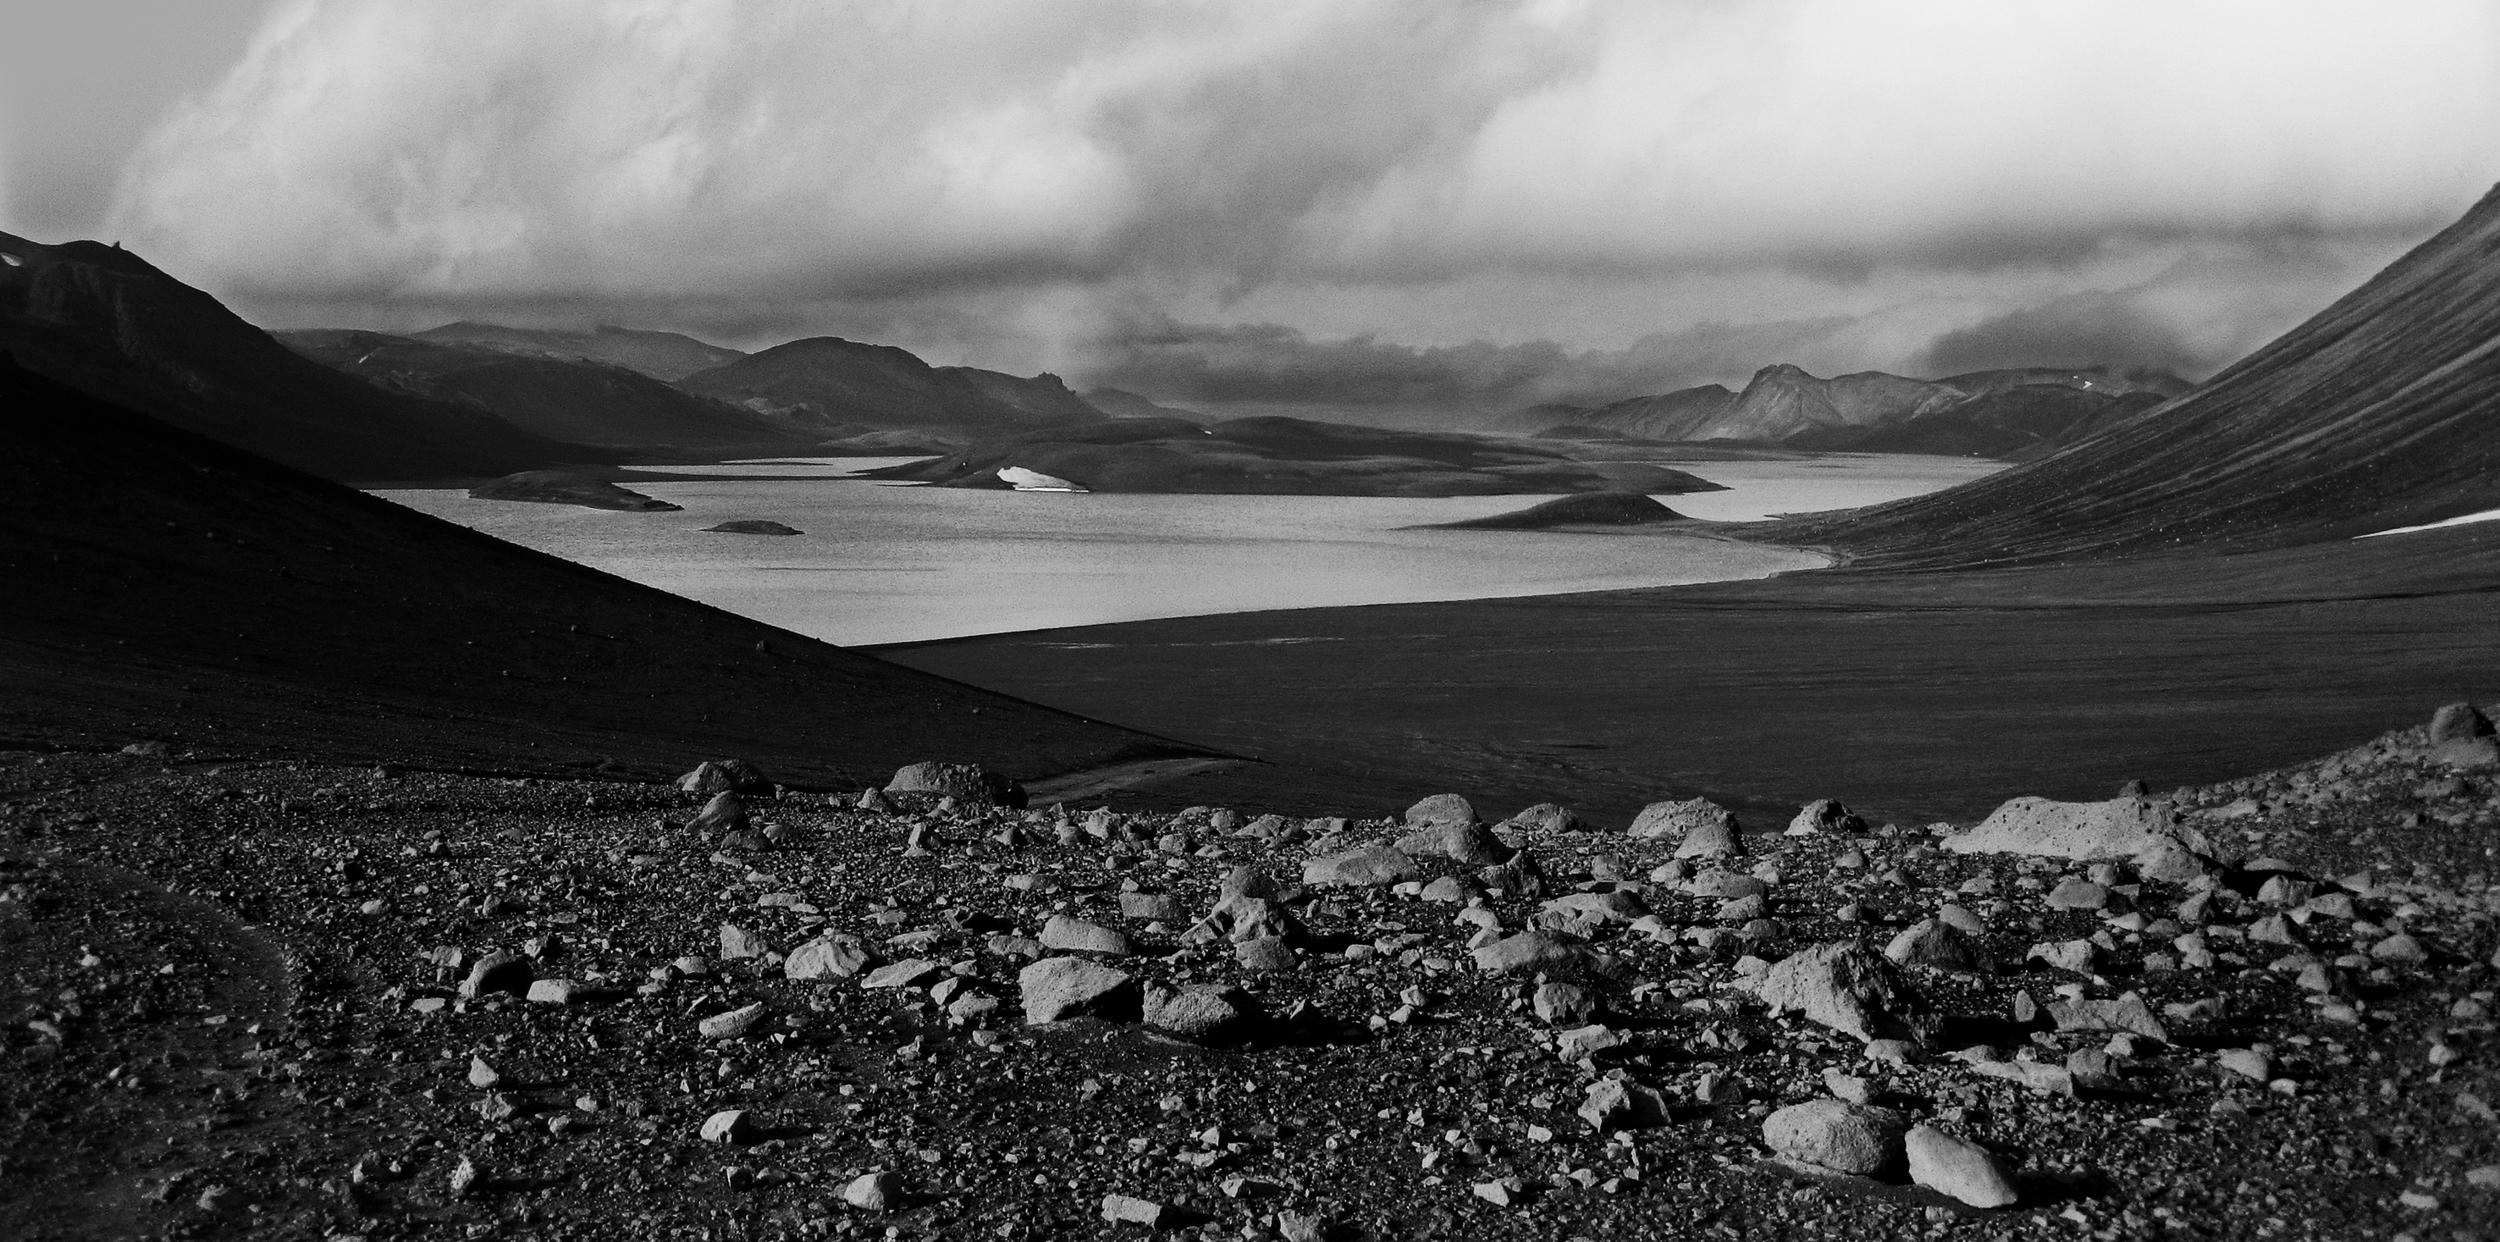 LANDMANALAUGAR - ISLAND